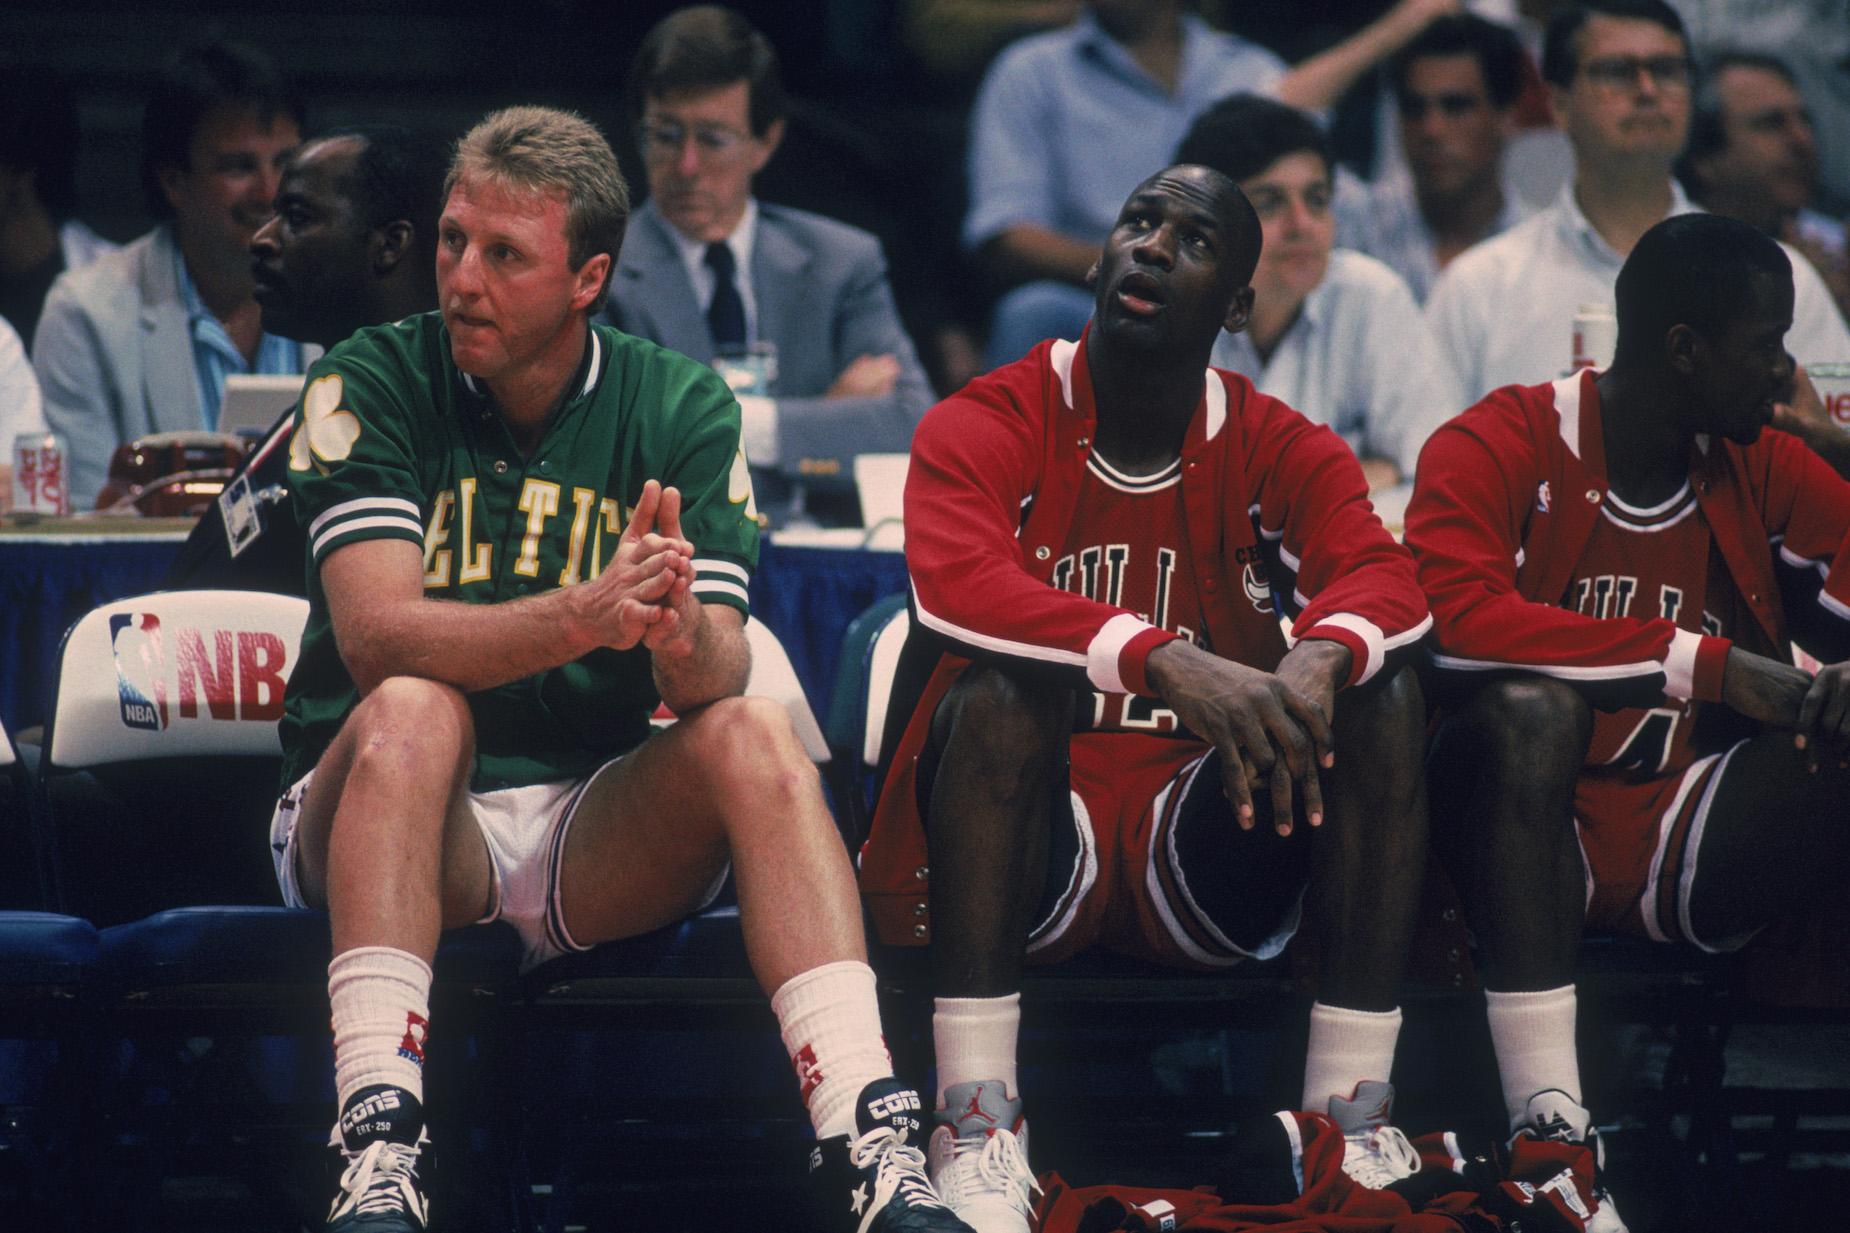 NBA legends Michael Jordan and Larry Bird sit together during an NBA All-Star event.